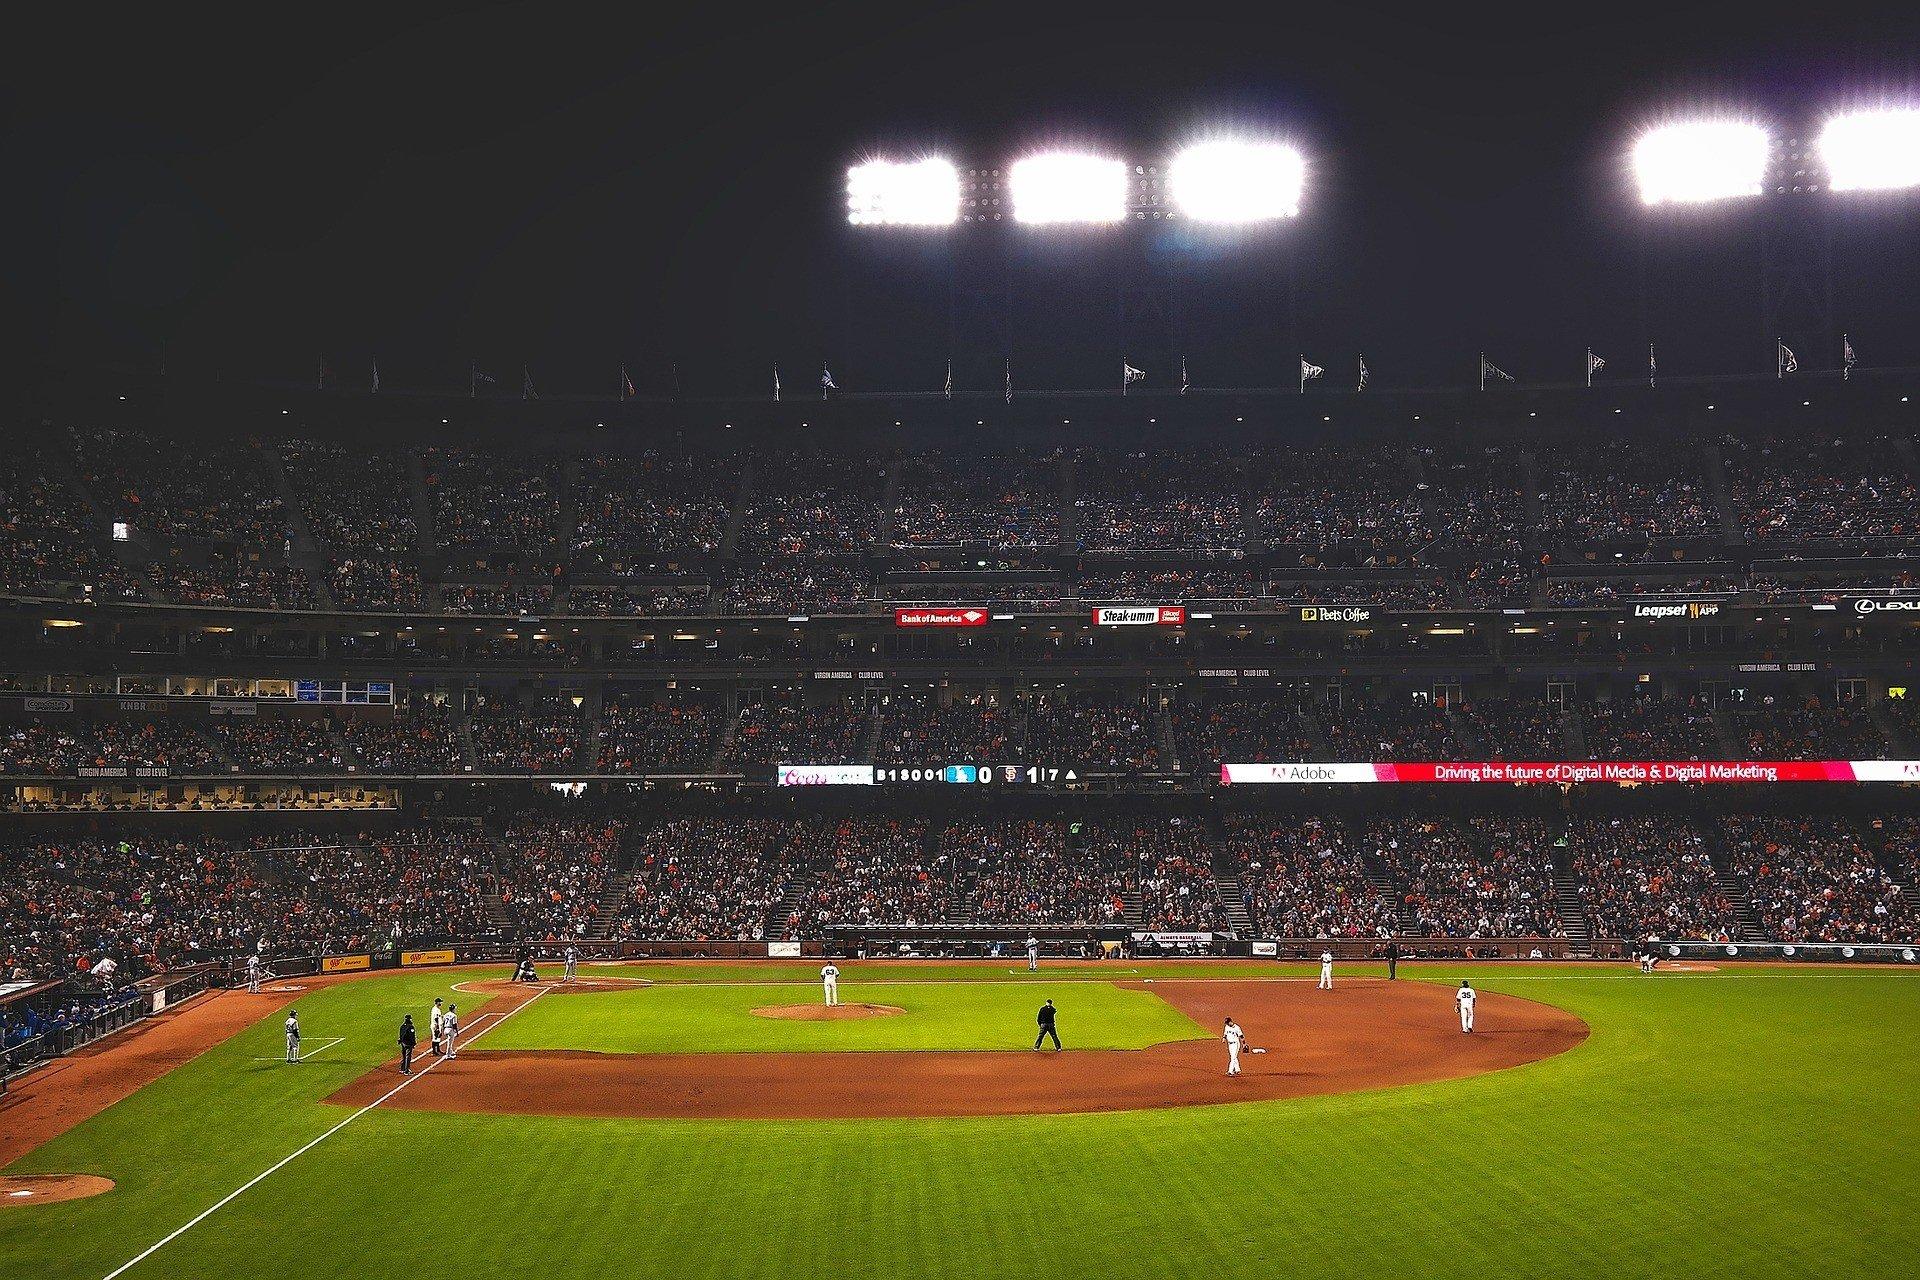 AT&T Park Baseball Game - Things to do in South of Market (SoMa), San Francisco